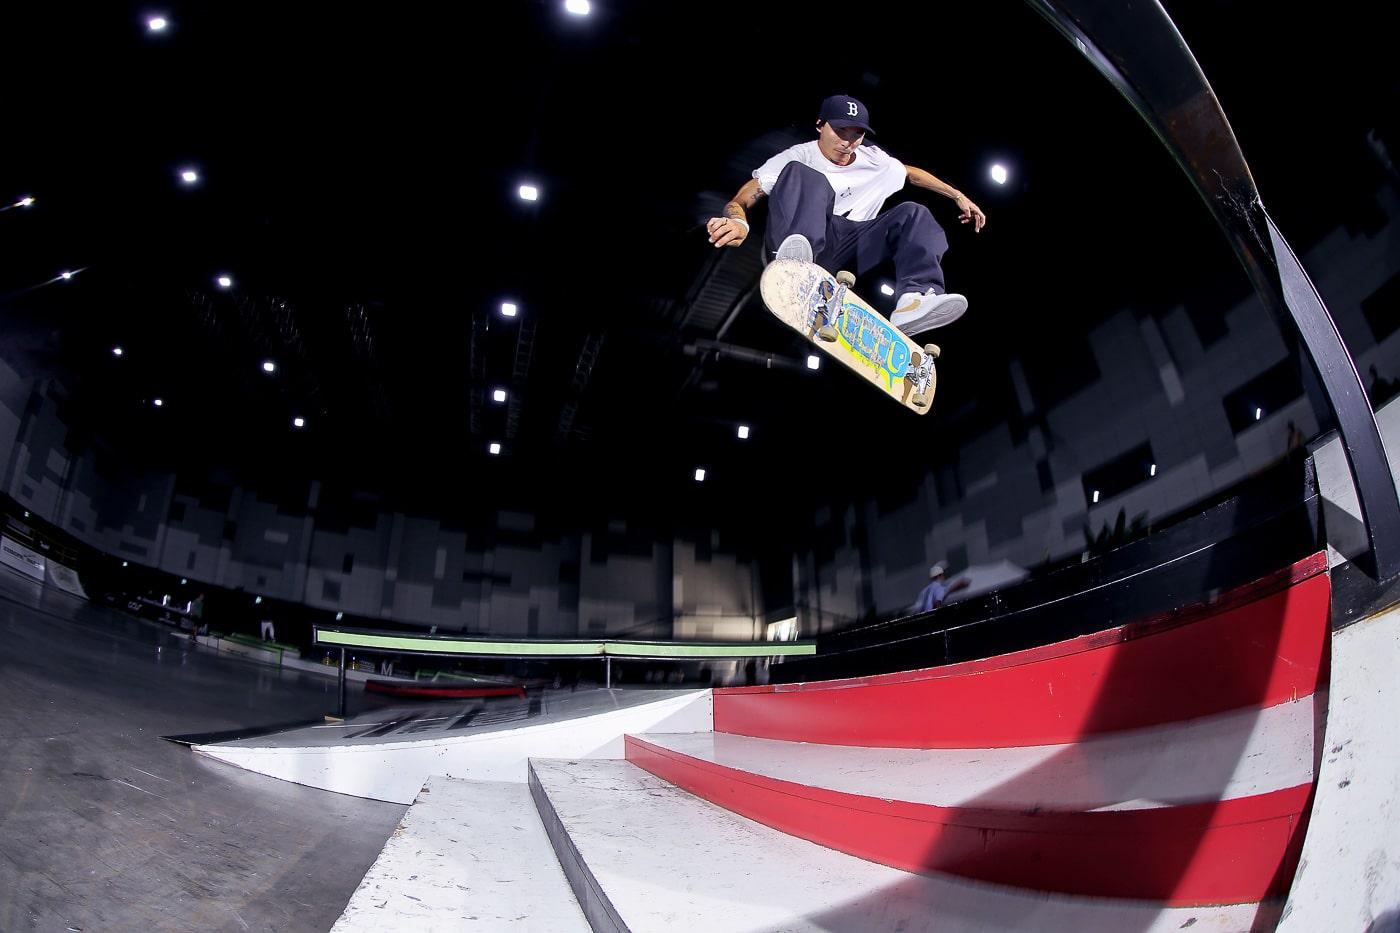 Club-of-skaters-cos-europapark-Thomas-Gentsch-photo-irregularskatemag-9